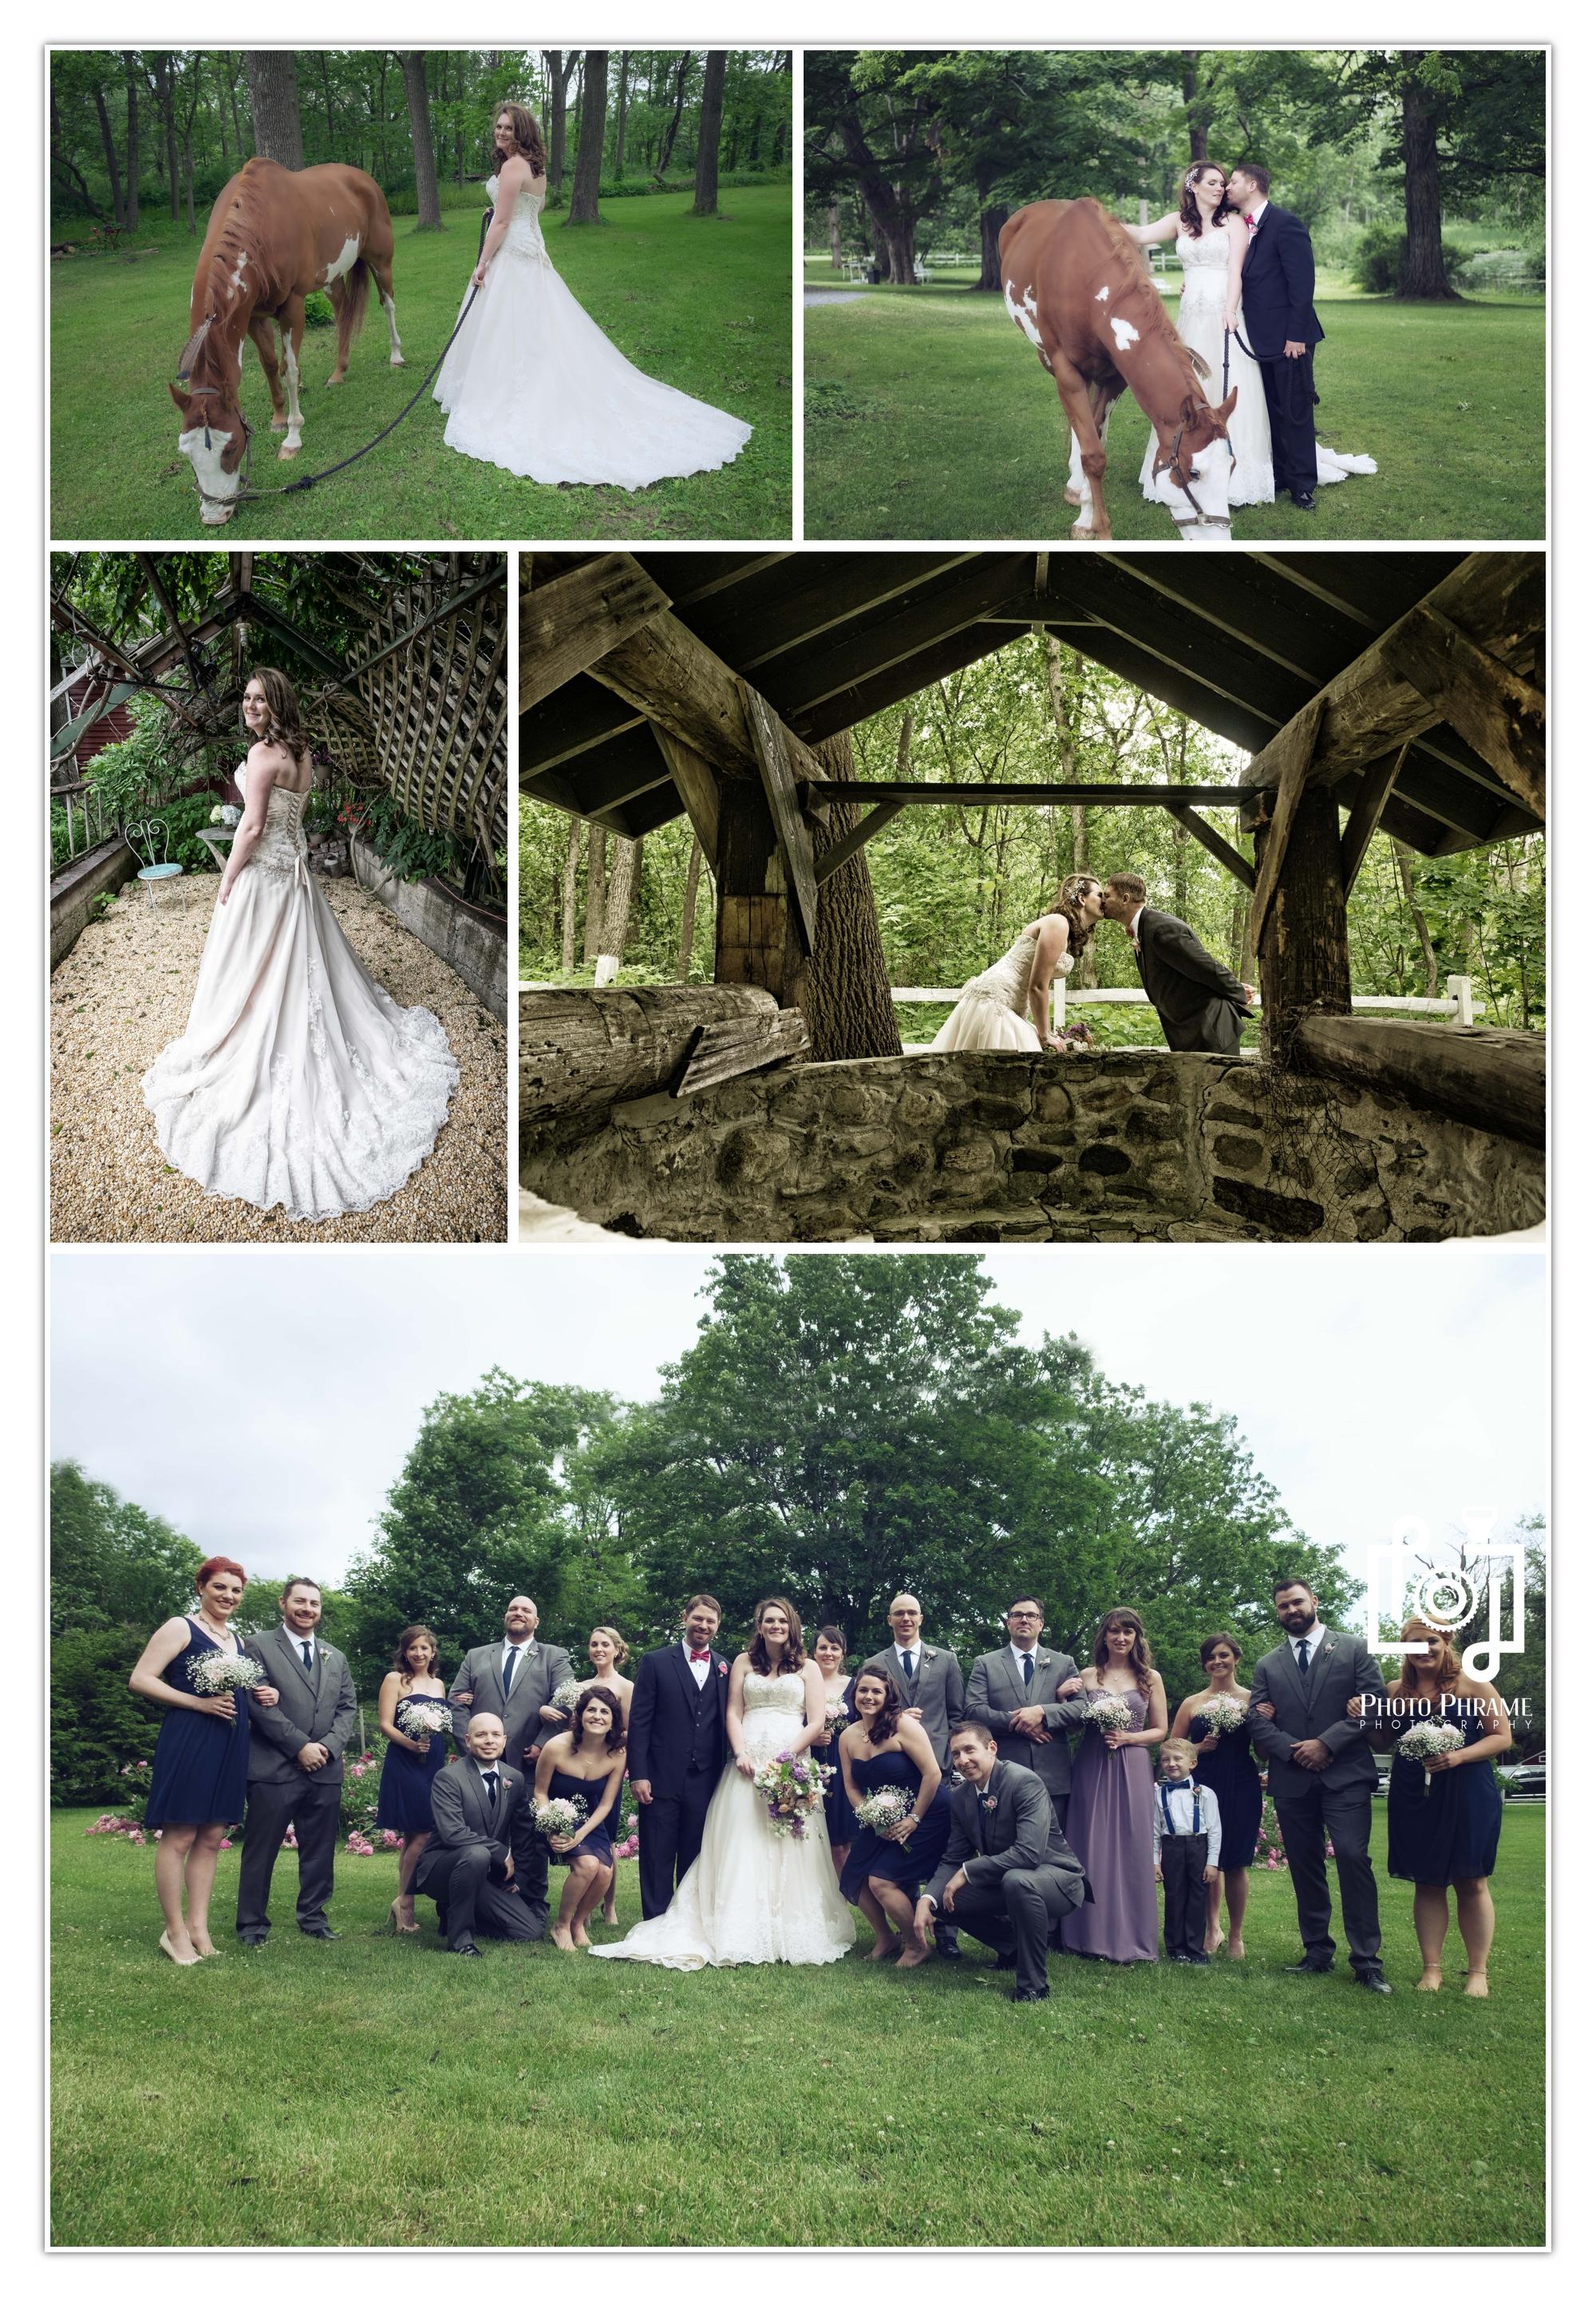 Appel Inn Wedding